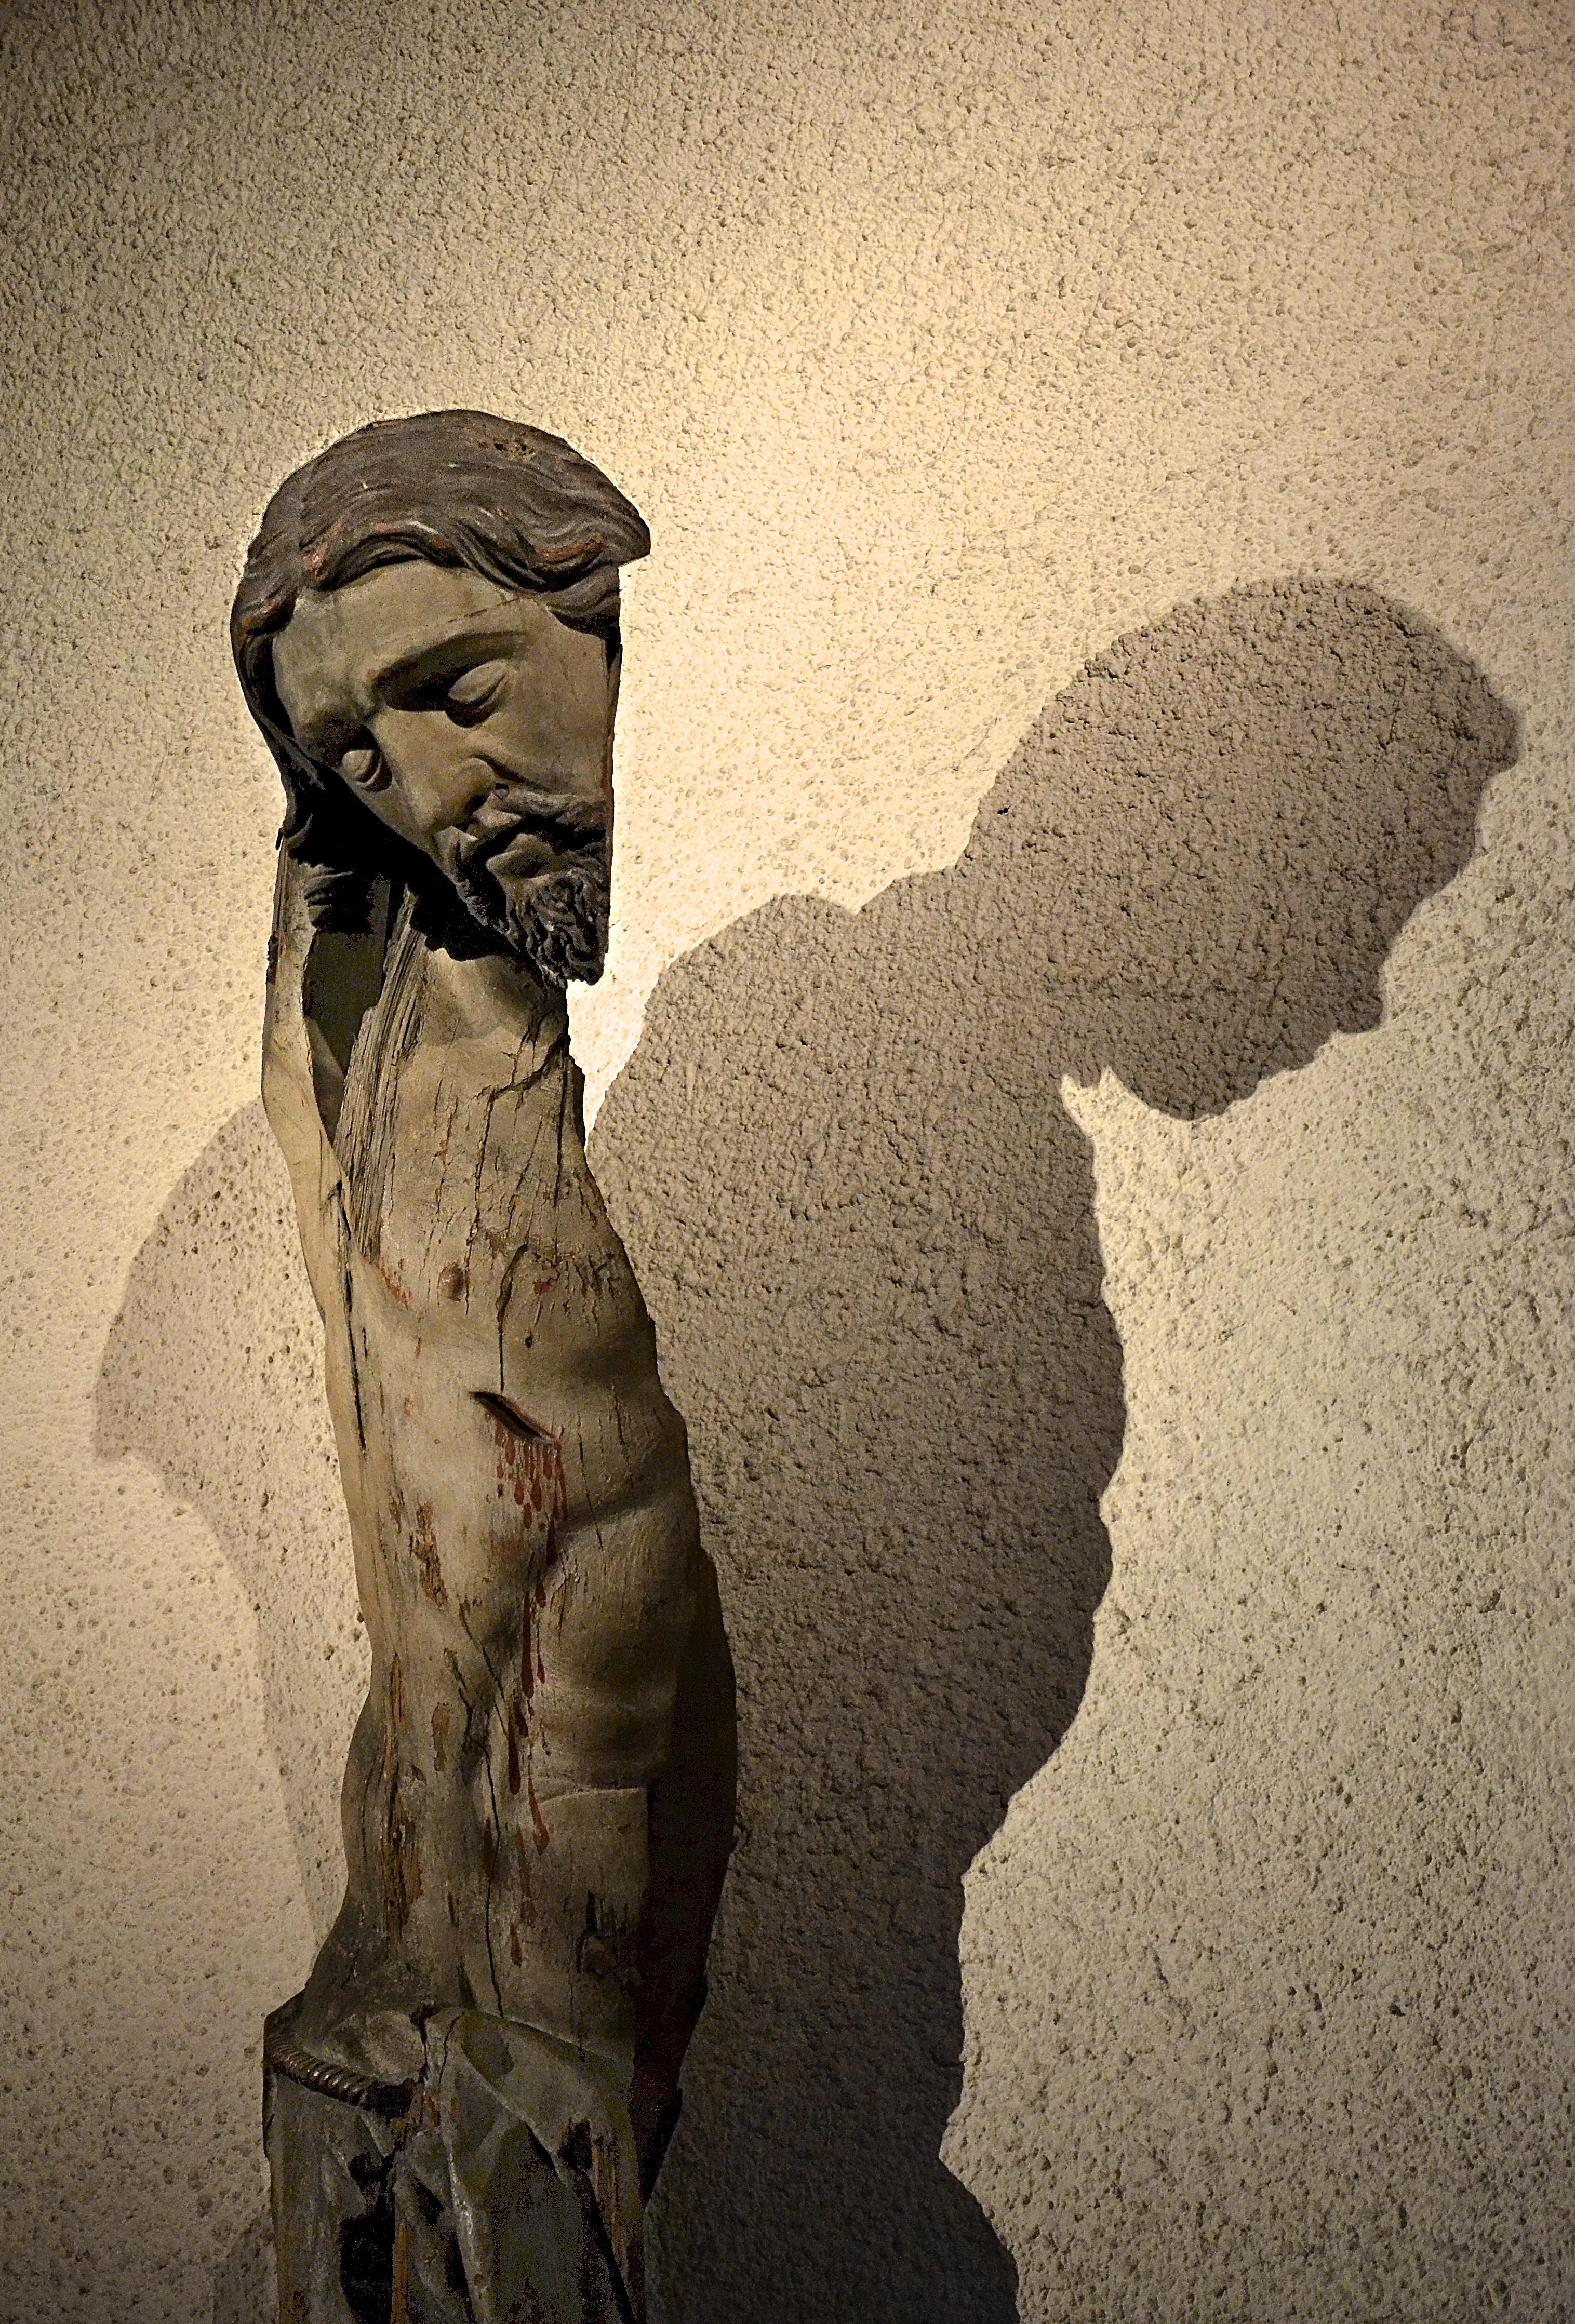 Split Christ born again in the shadow.